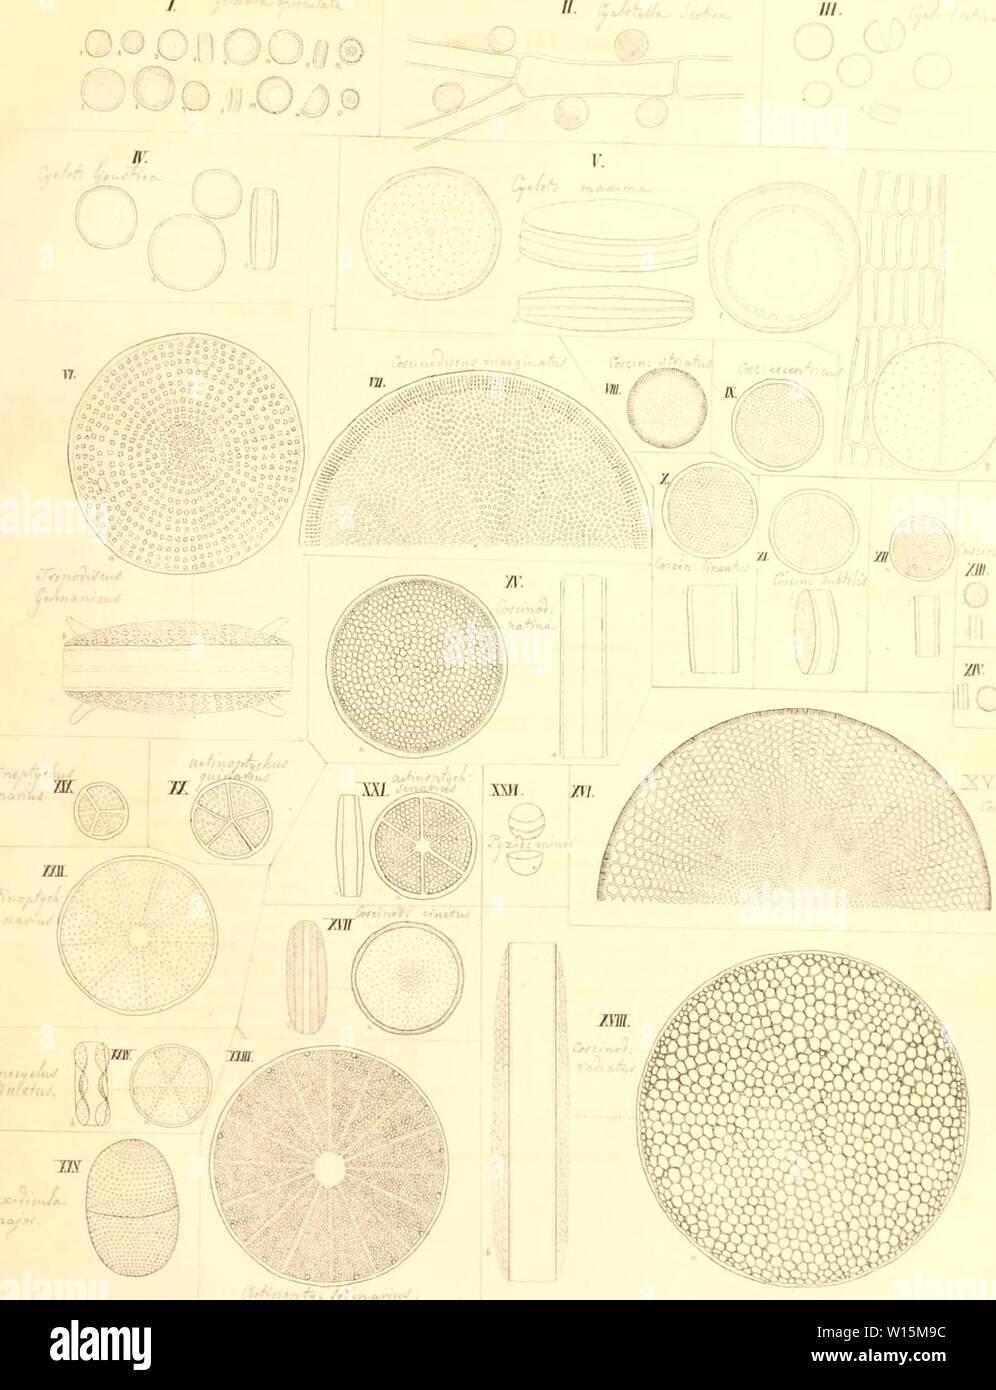 Archive image from page 164 of Die kieselschaligen Bacillarien oder Diatomeen. Die kieselschaligen Bacillarien oder Diatomeen . diekieselschalig00ktzi Year: 1844  / : Stock Photo